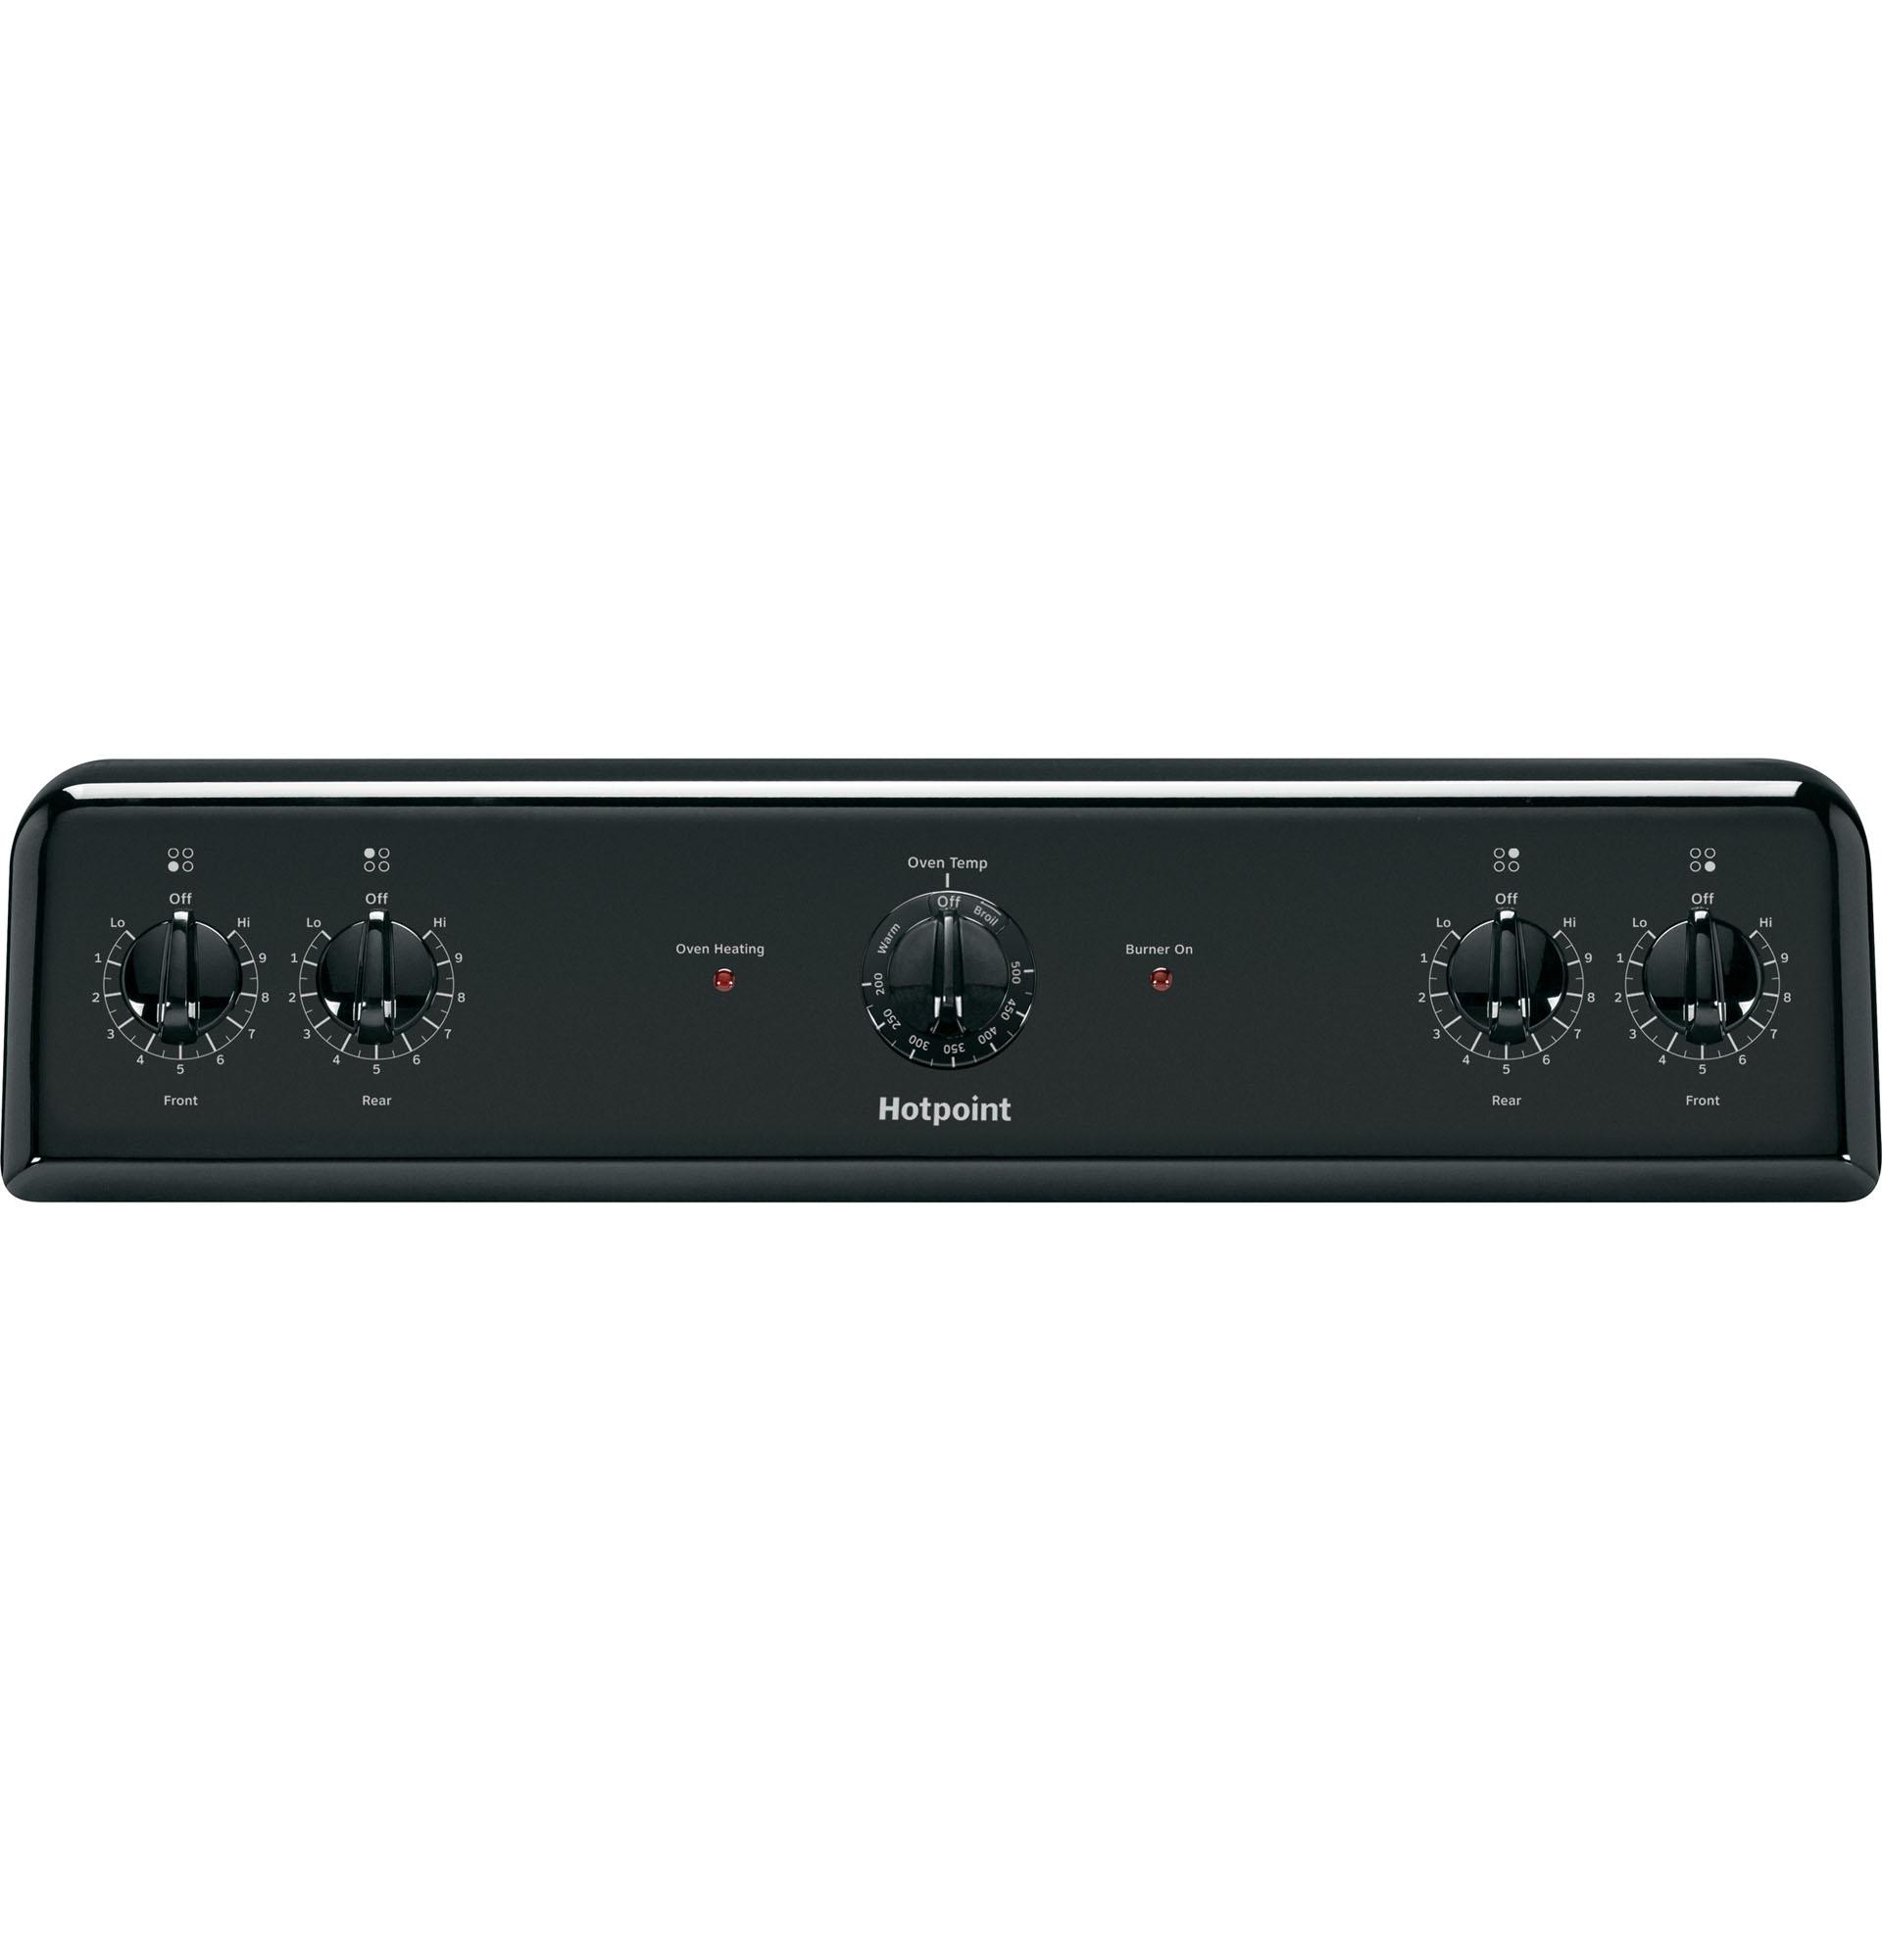 Hotpoint RB525DHBB 5.0 cu. ft. Freestanding Electric Range - Black